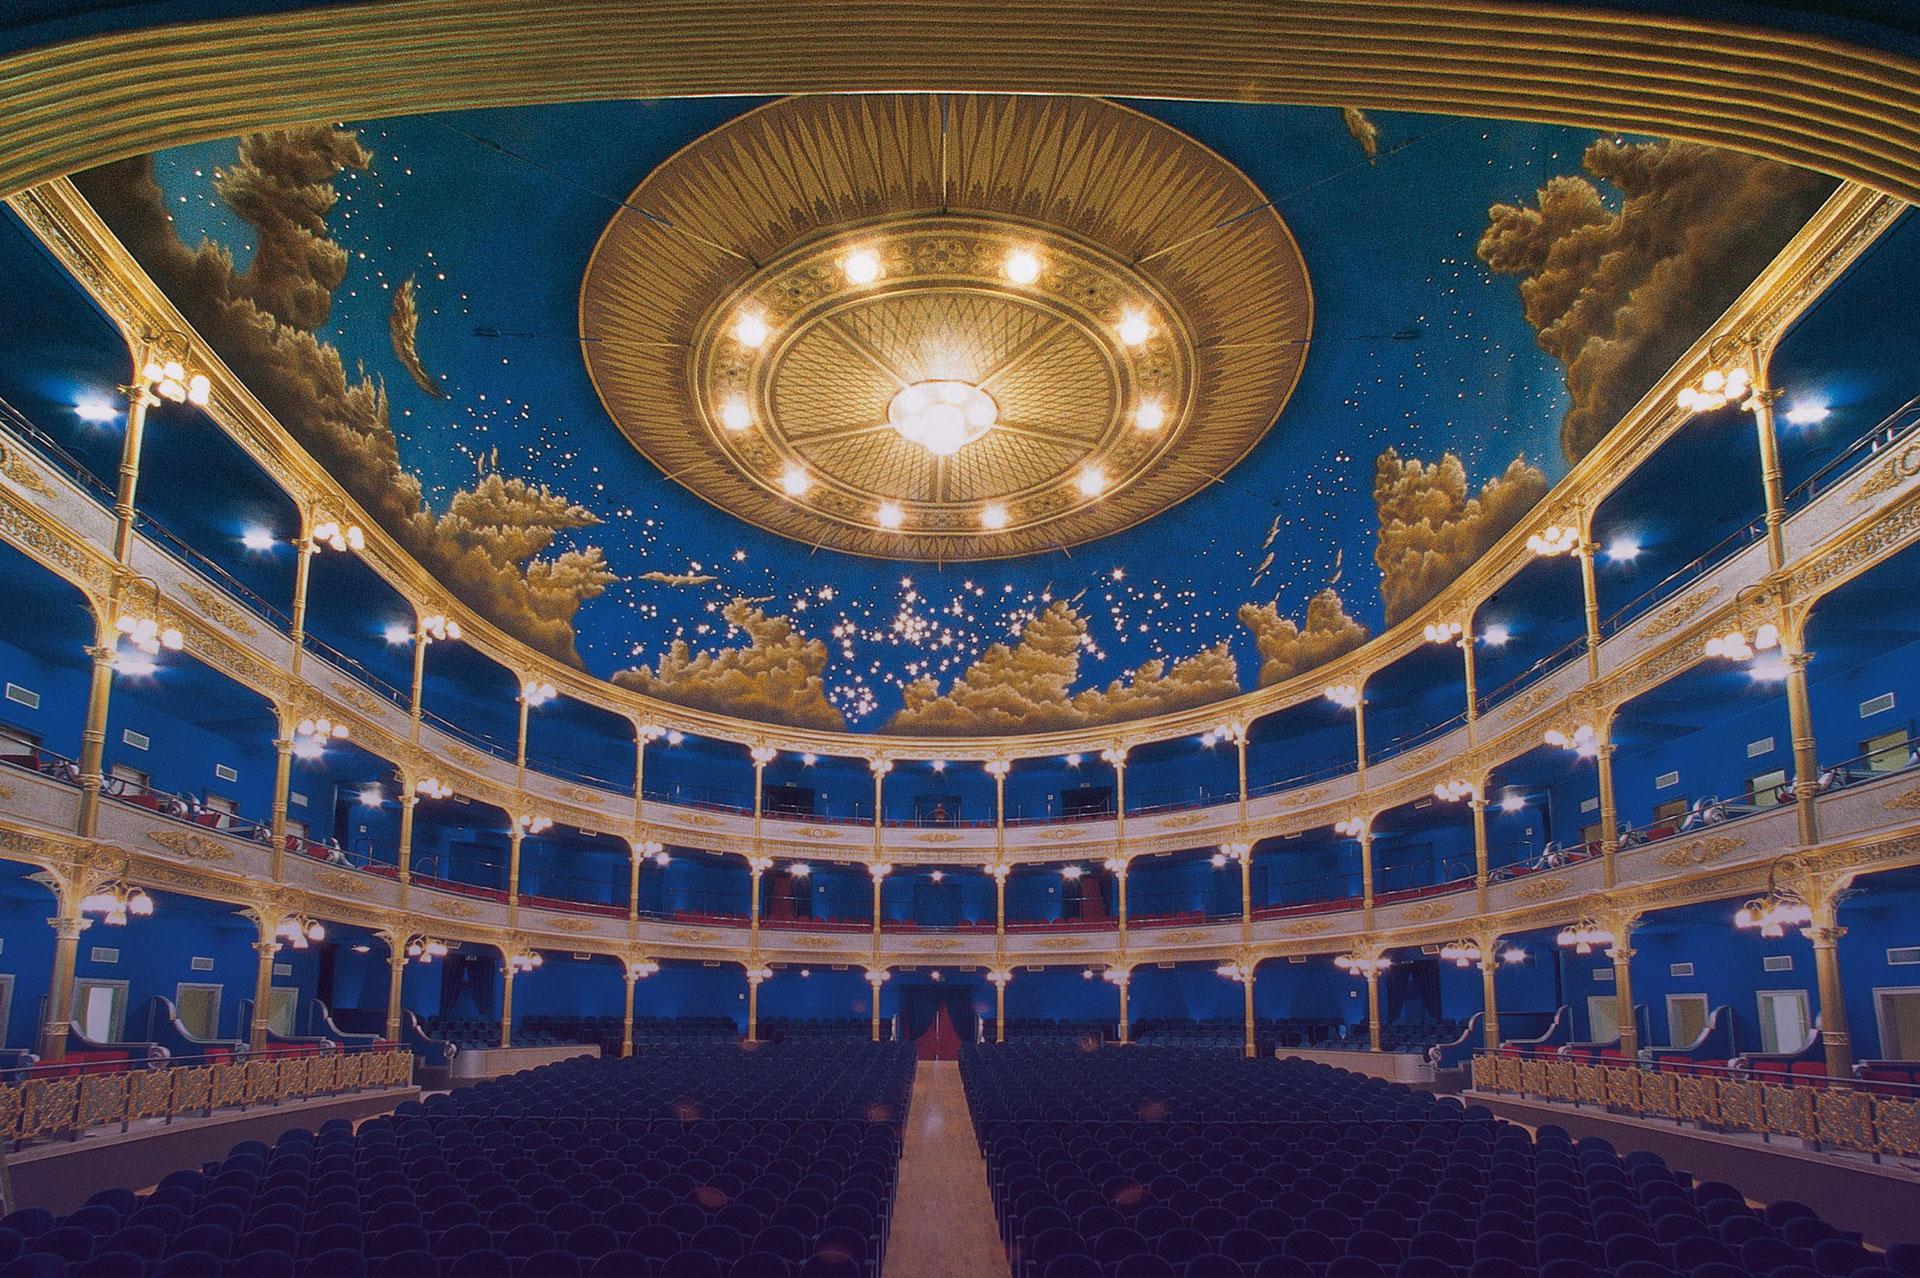 Expo veneto verona and soave between opera castles and italian